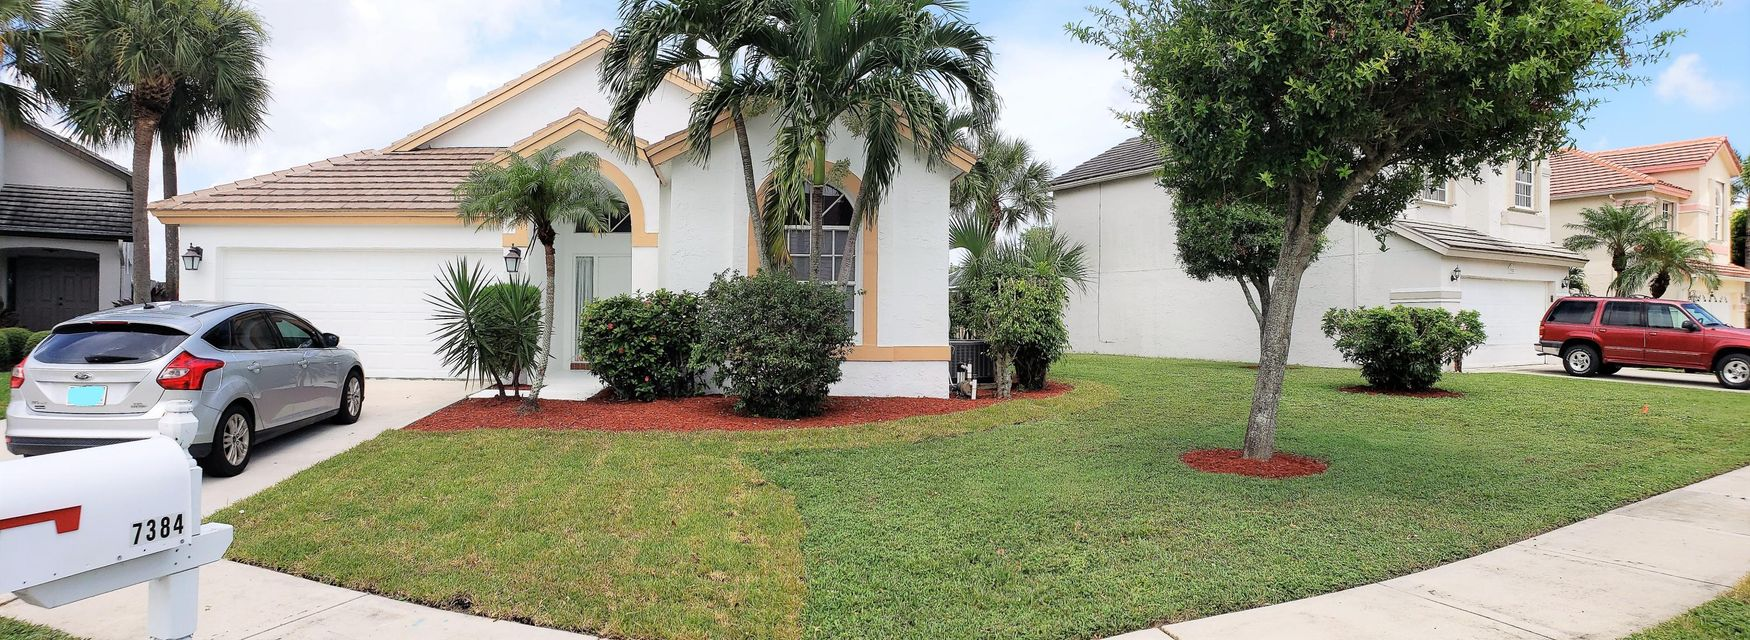 7384 Ashley Shores Circle Lake Worth, FL 33467